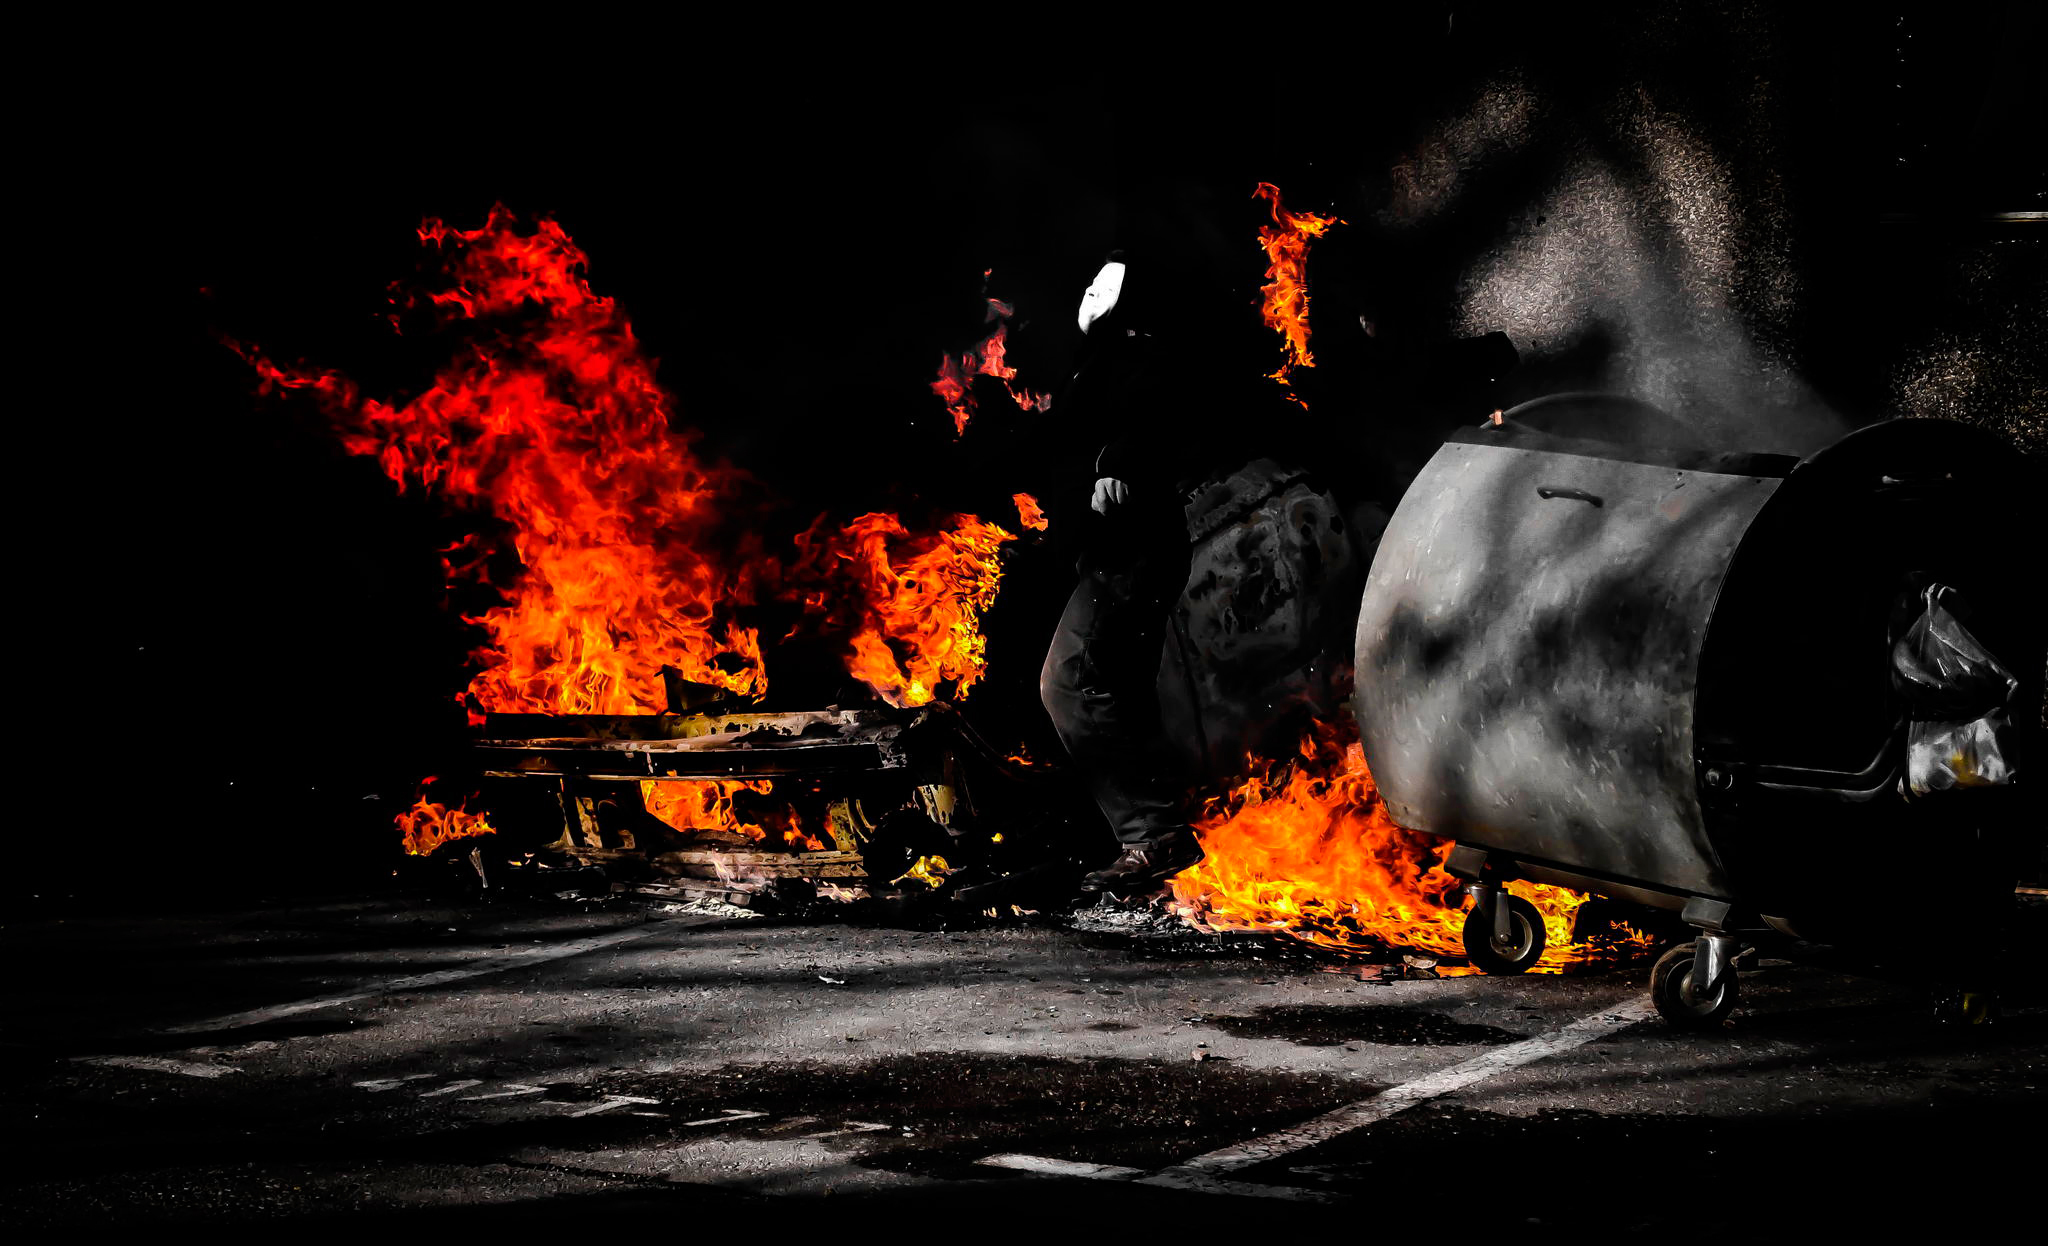 Wallpaper bosnia live fire fire wallpapers situations   download 2048x1246